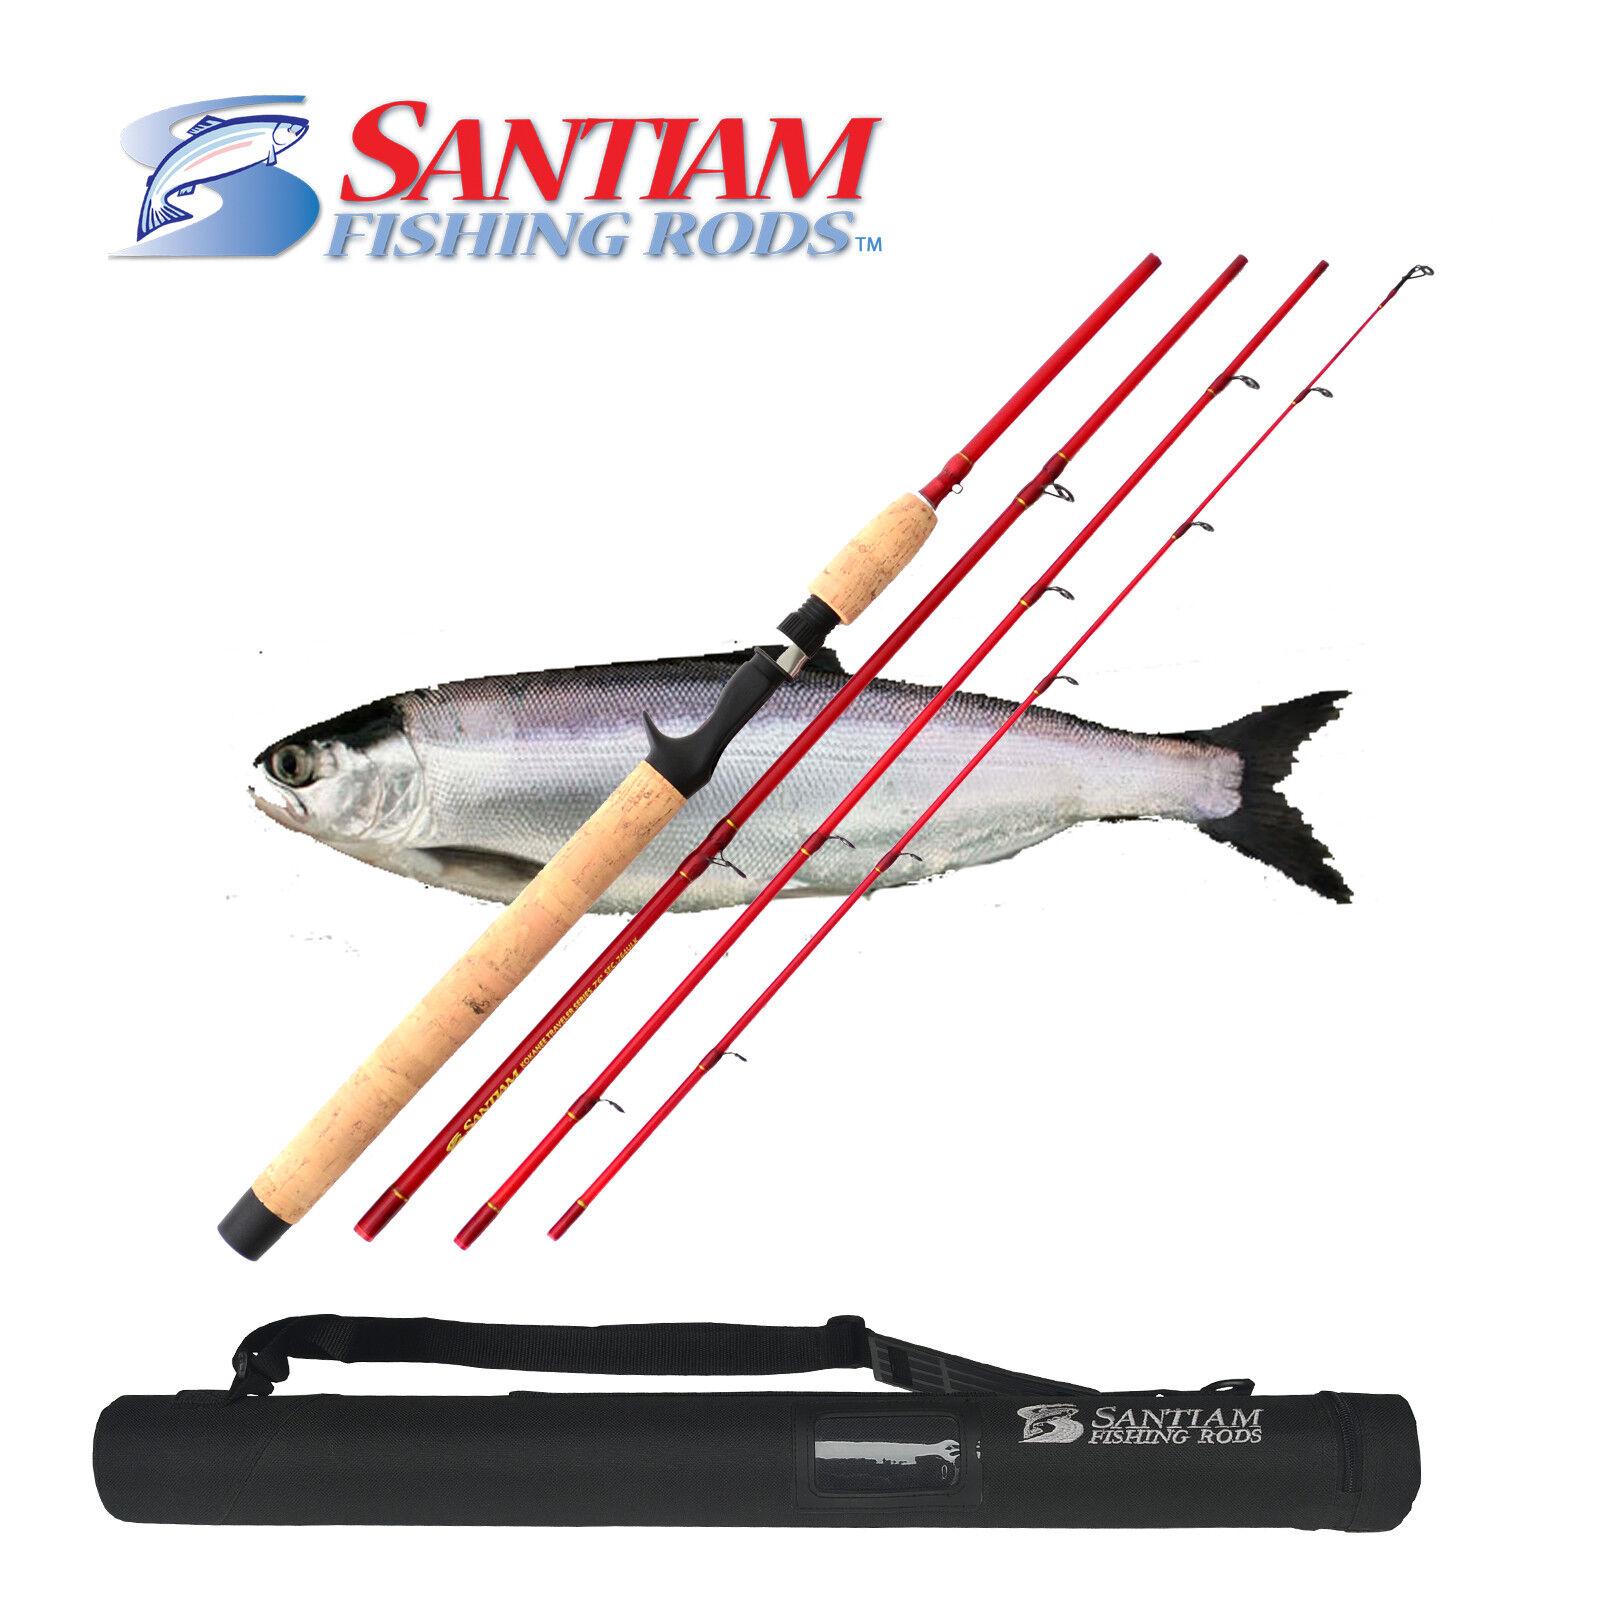 Santiam  Fishing Rods 4 PC 7'6  4-10lb UL Glass Kokanee Trout Travel Rod  best price